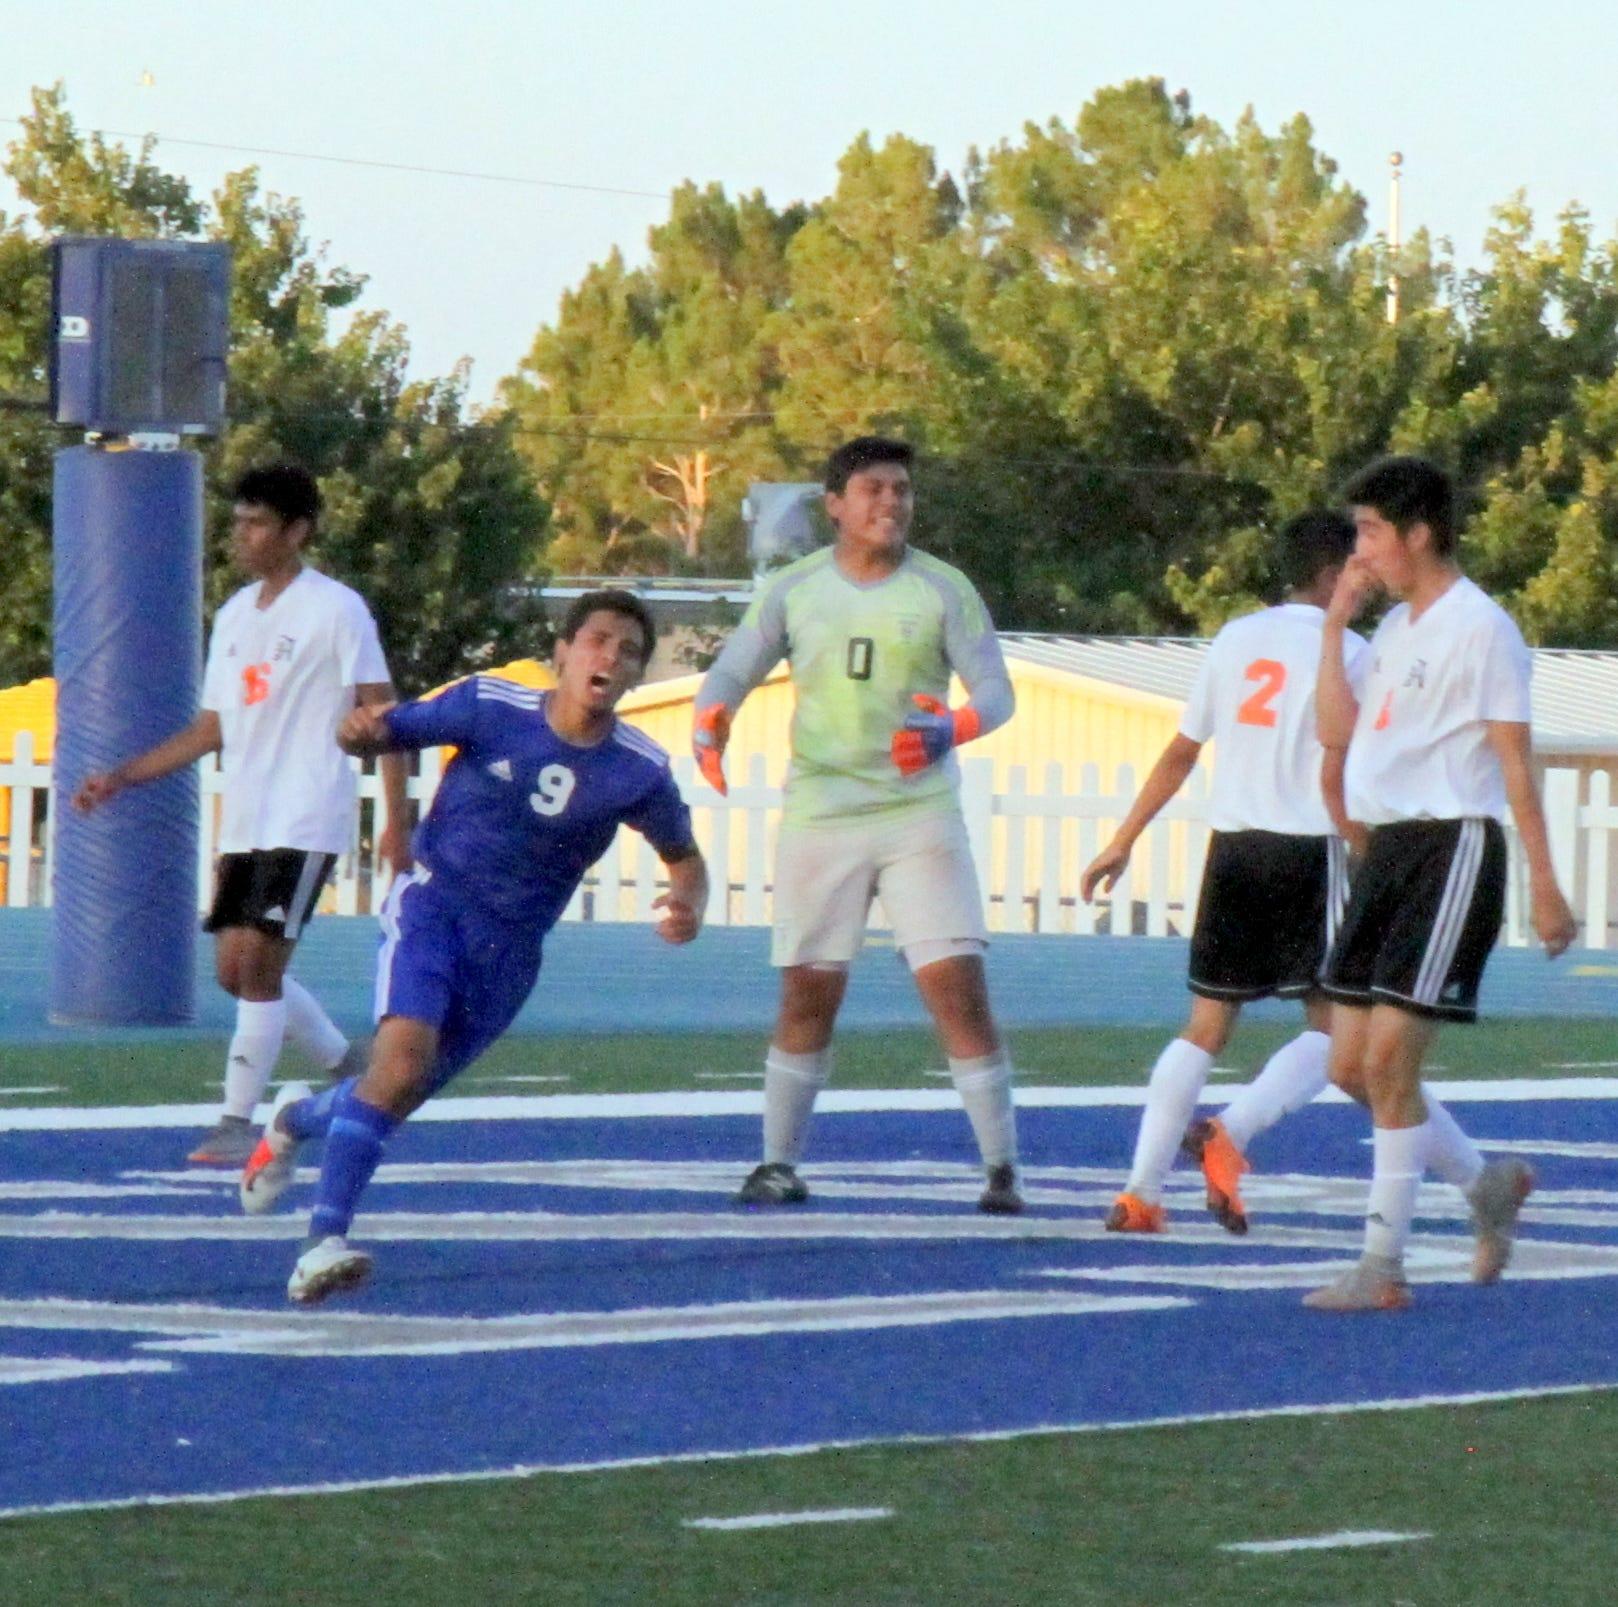 CNM_Carlsbad boys soccer vs. Artesia 9.18